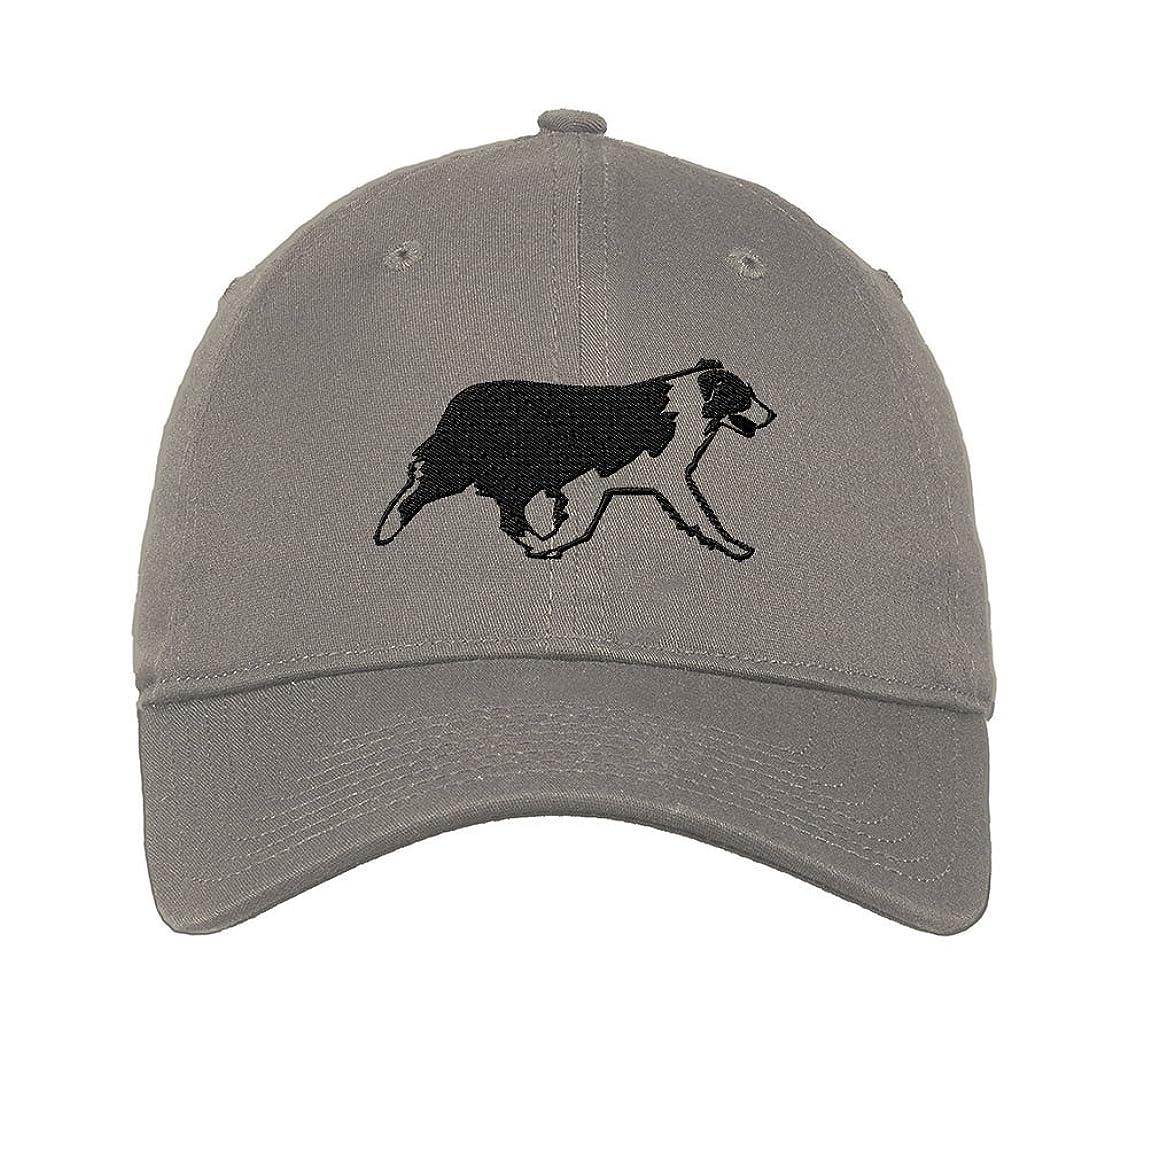 Australian Shepherd Dog Silhouette Twill Cotton 6 Panel Low Profile Hat Light Grey